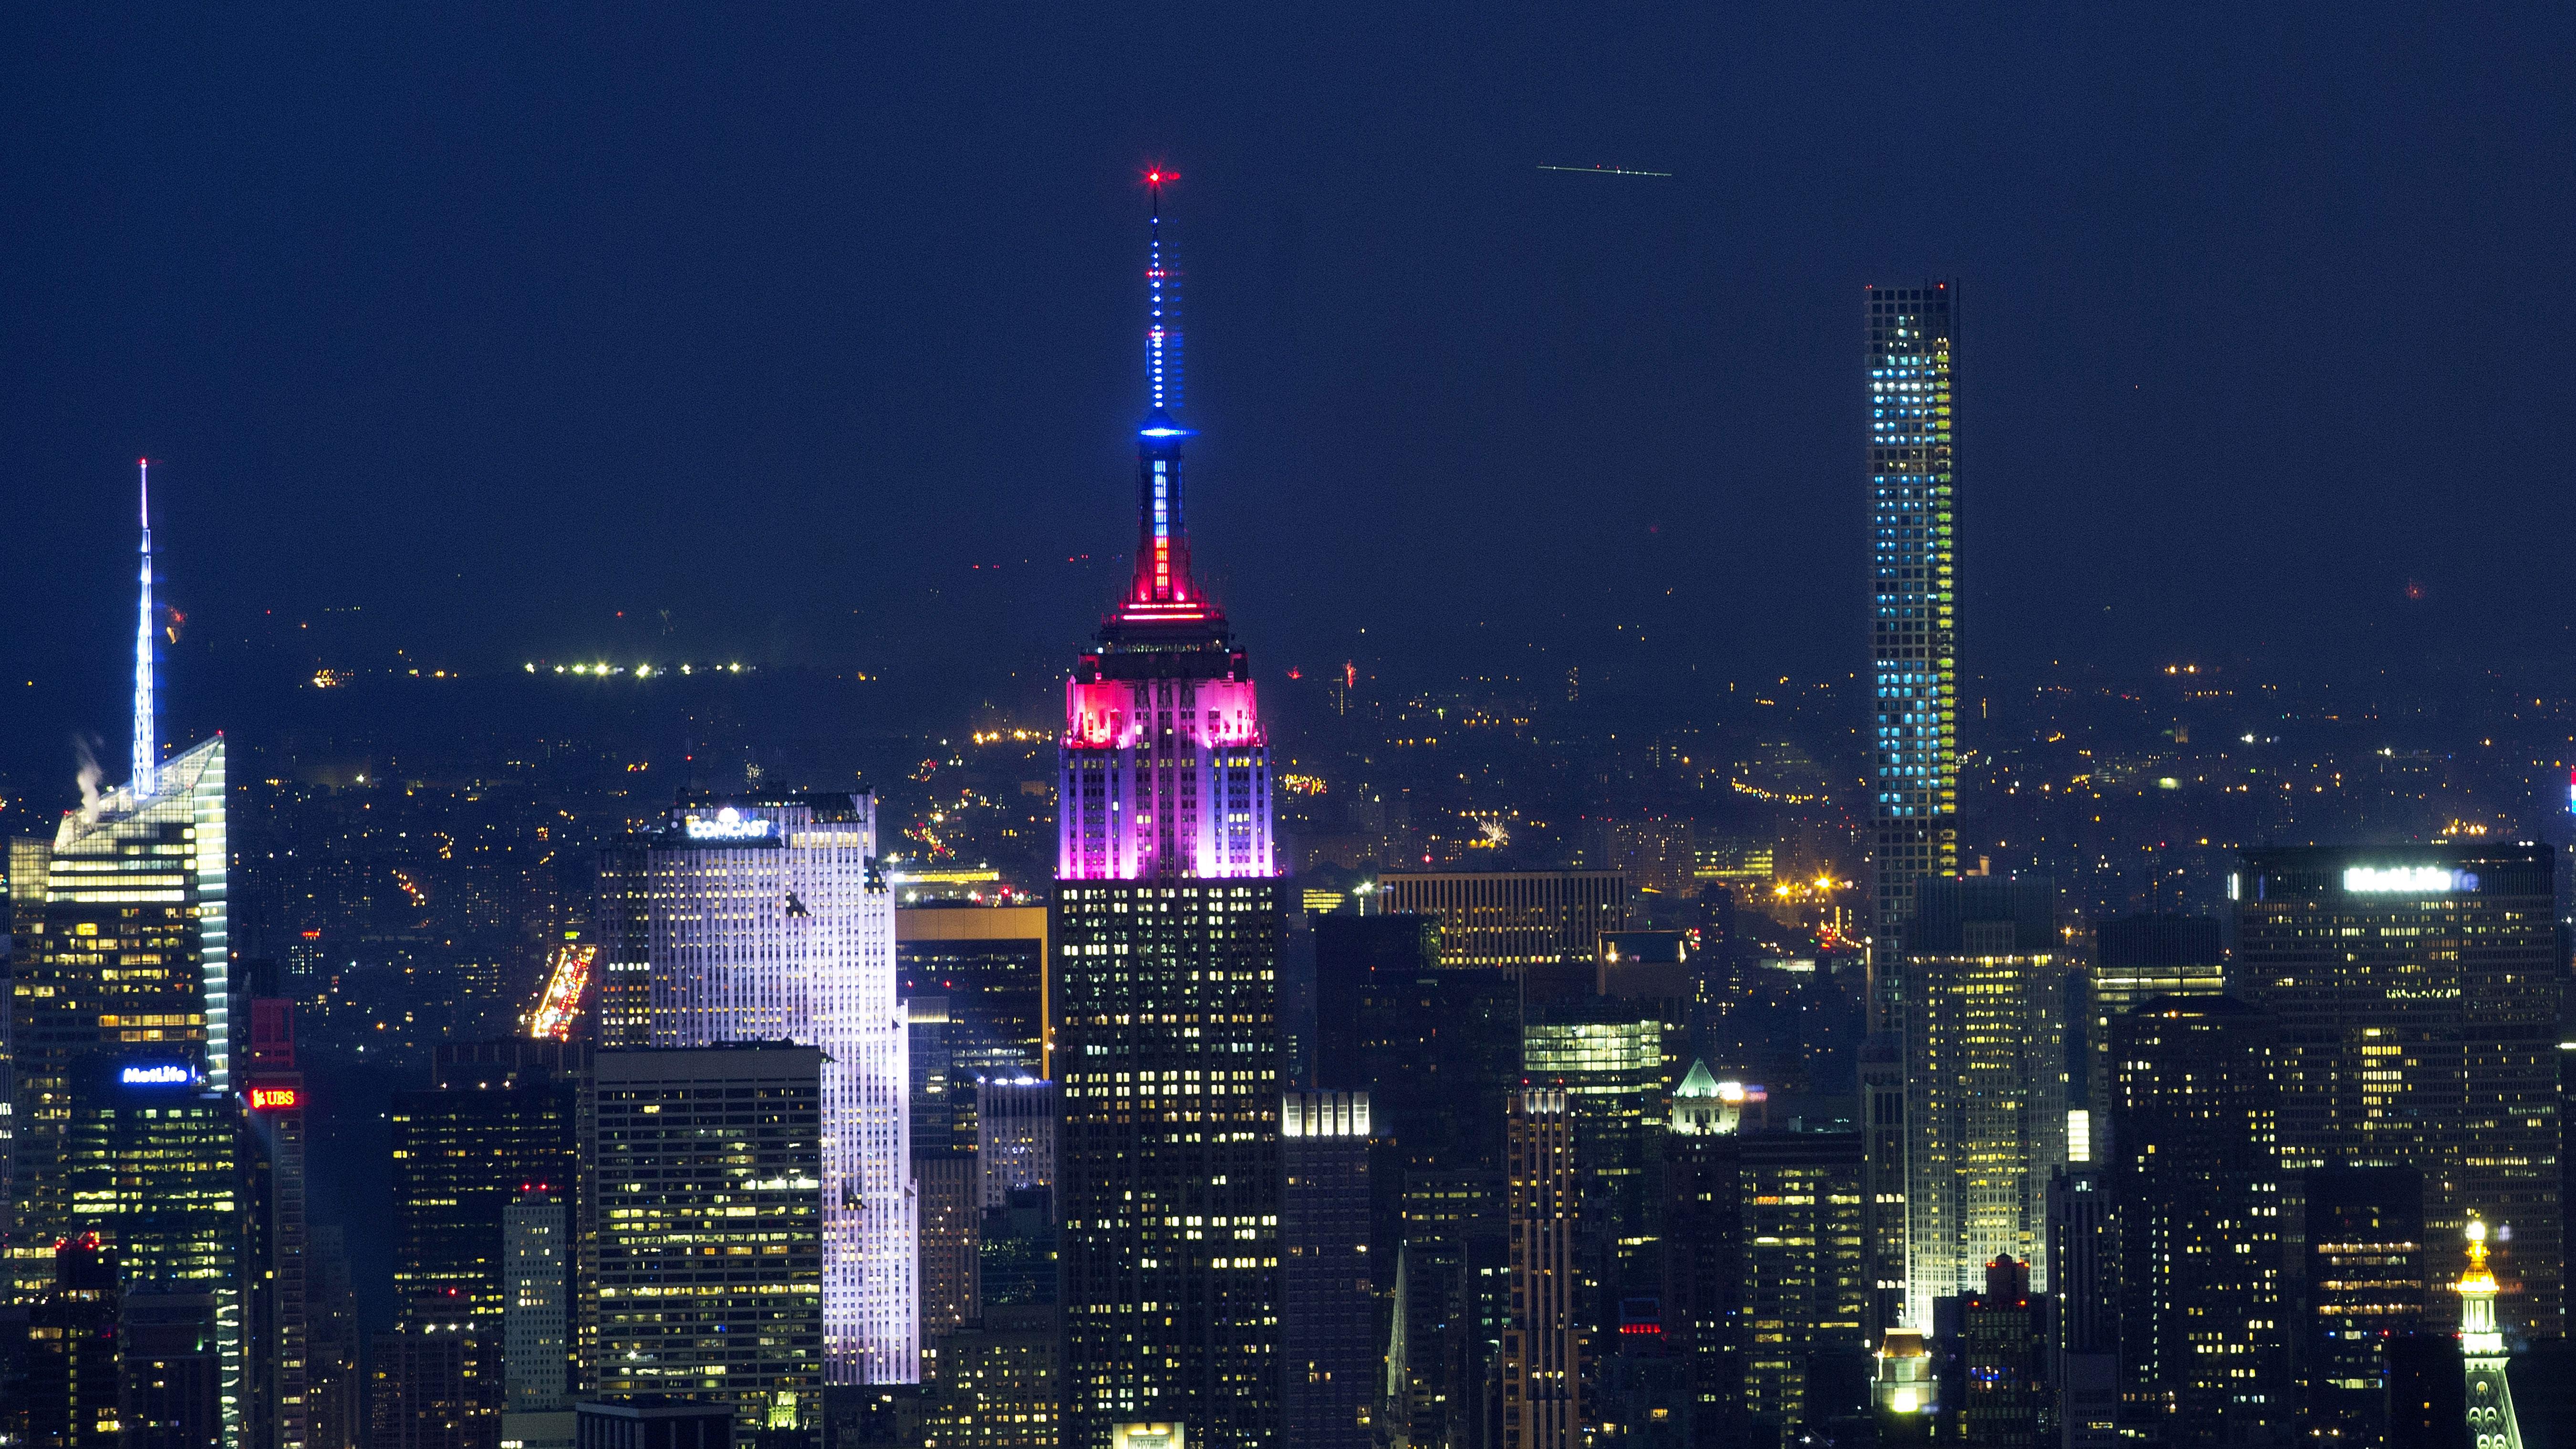 Download Wallpaper Night Empire State Building - empire-state-building  Picture-987056.jpg?quality\u003d80\u0026strip\u003dall\u0026w\u003d5400